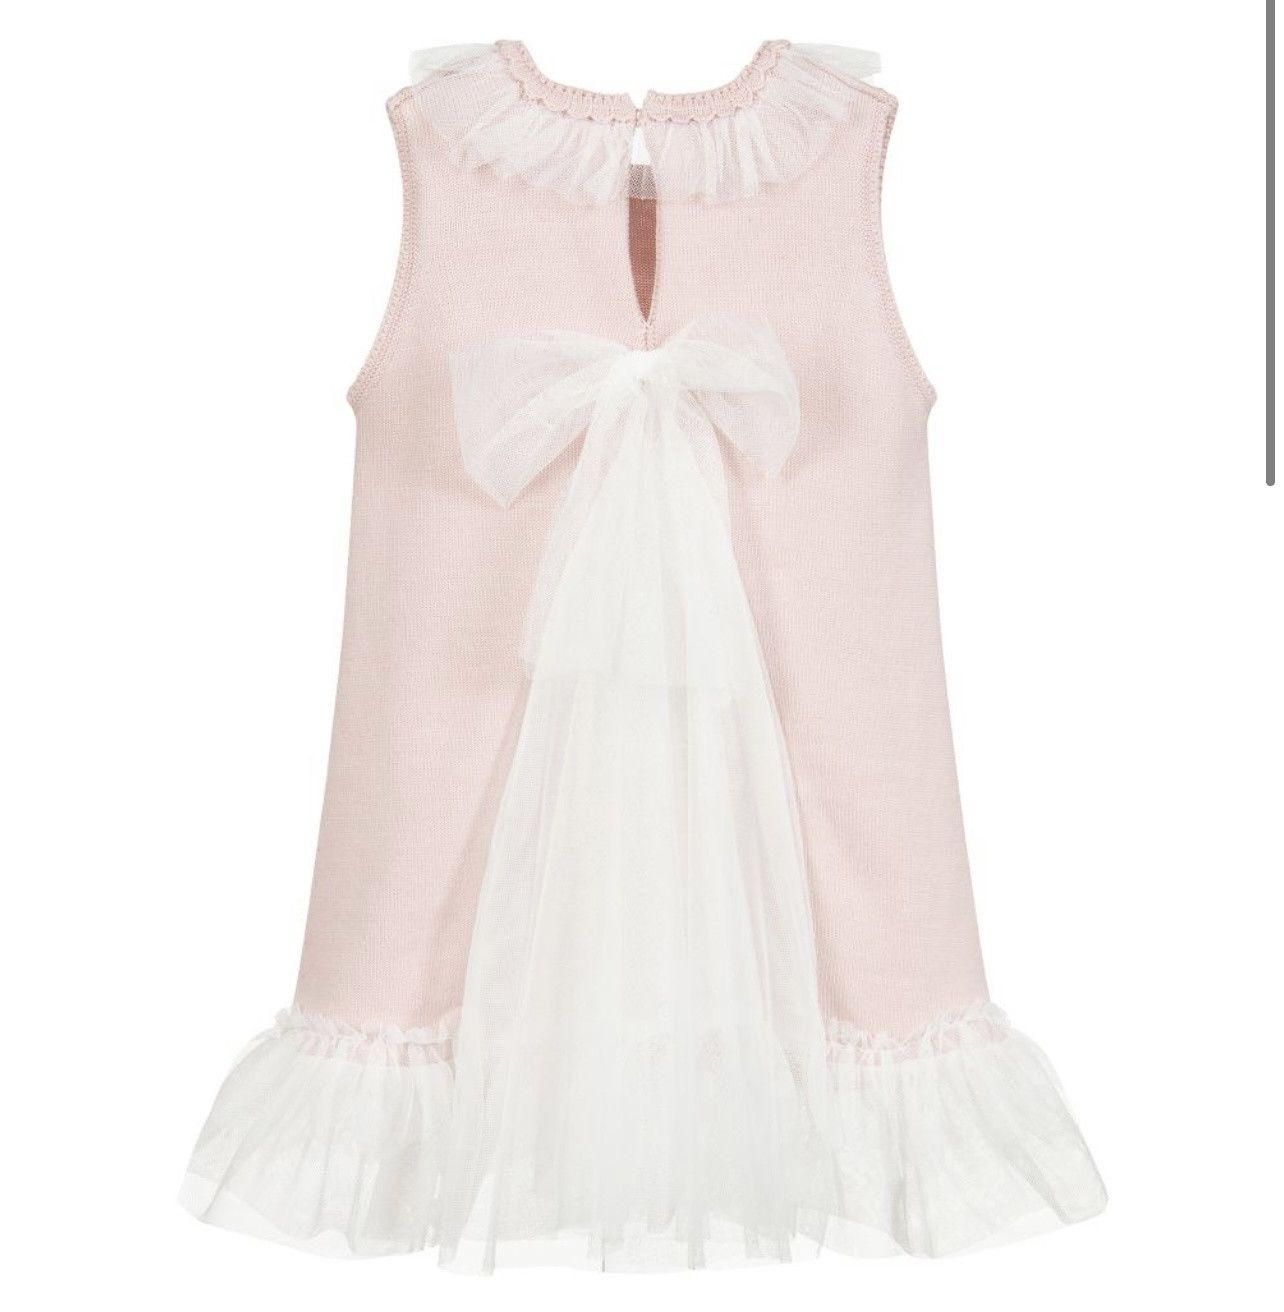 Artesania Granlei Artesania Granlei Dusky Pink Knitted Dress